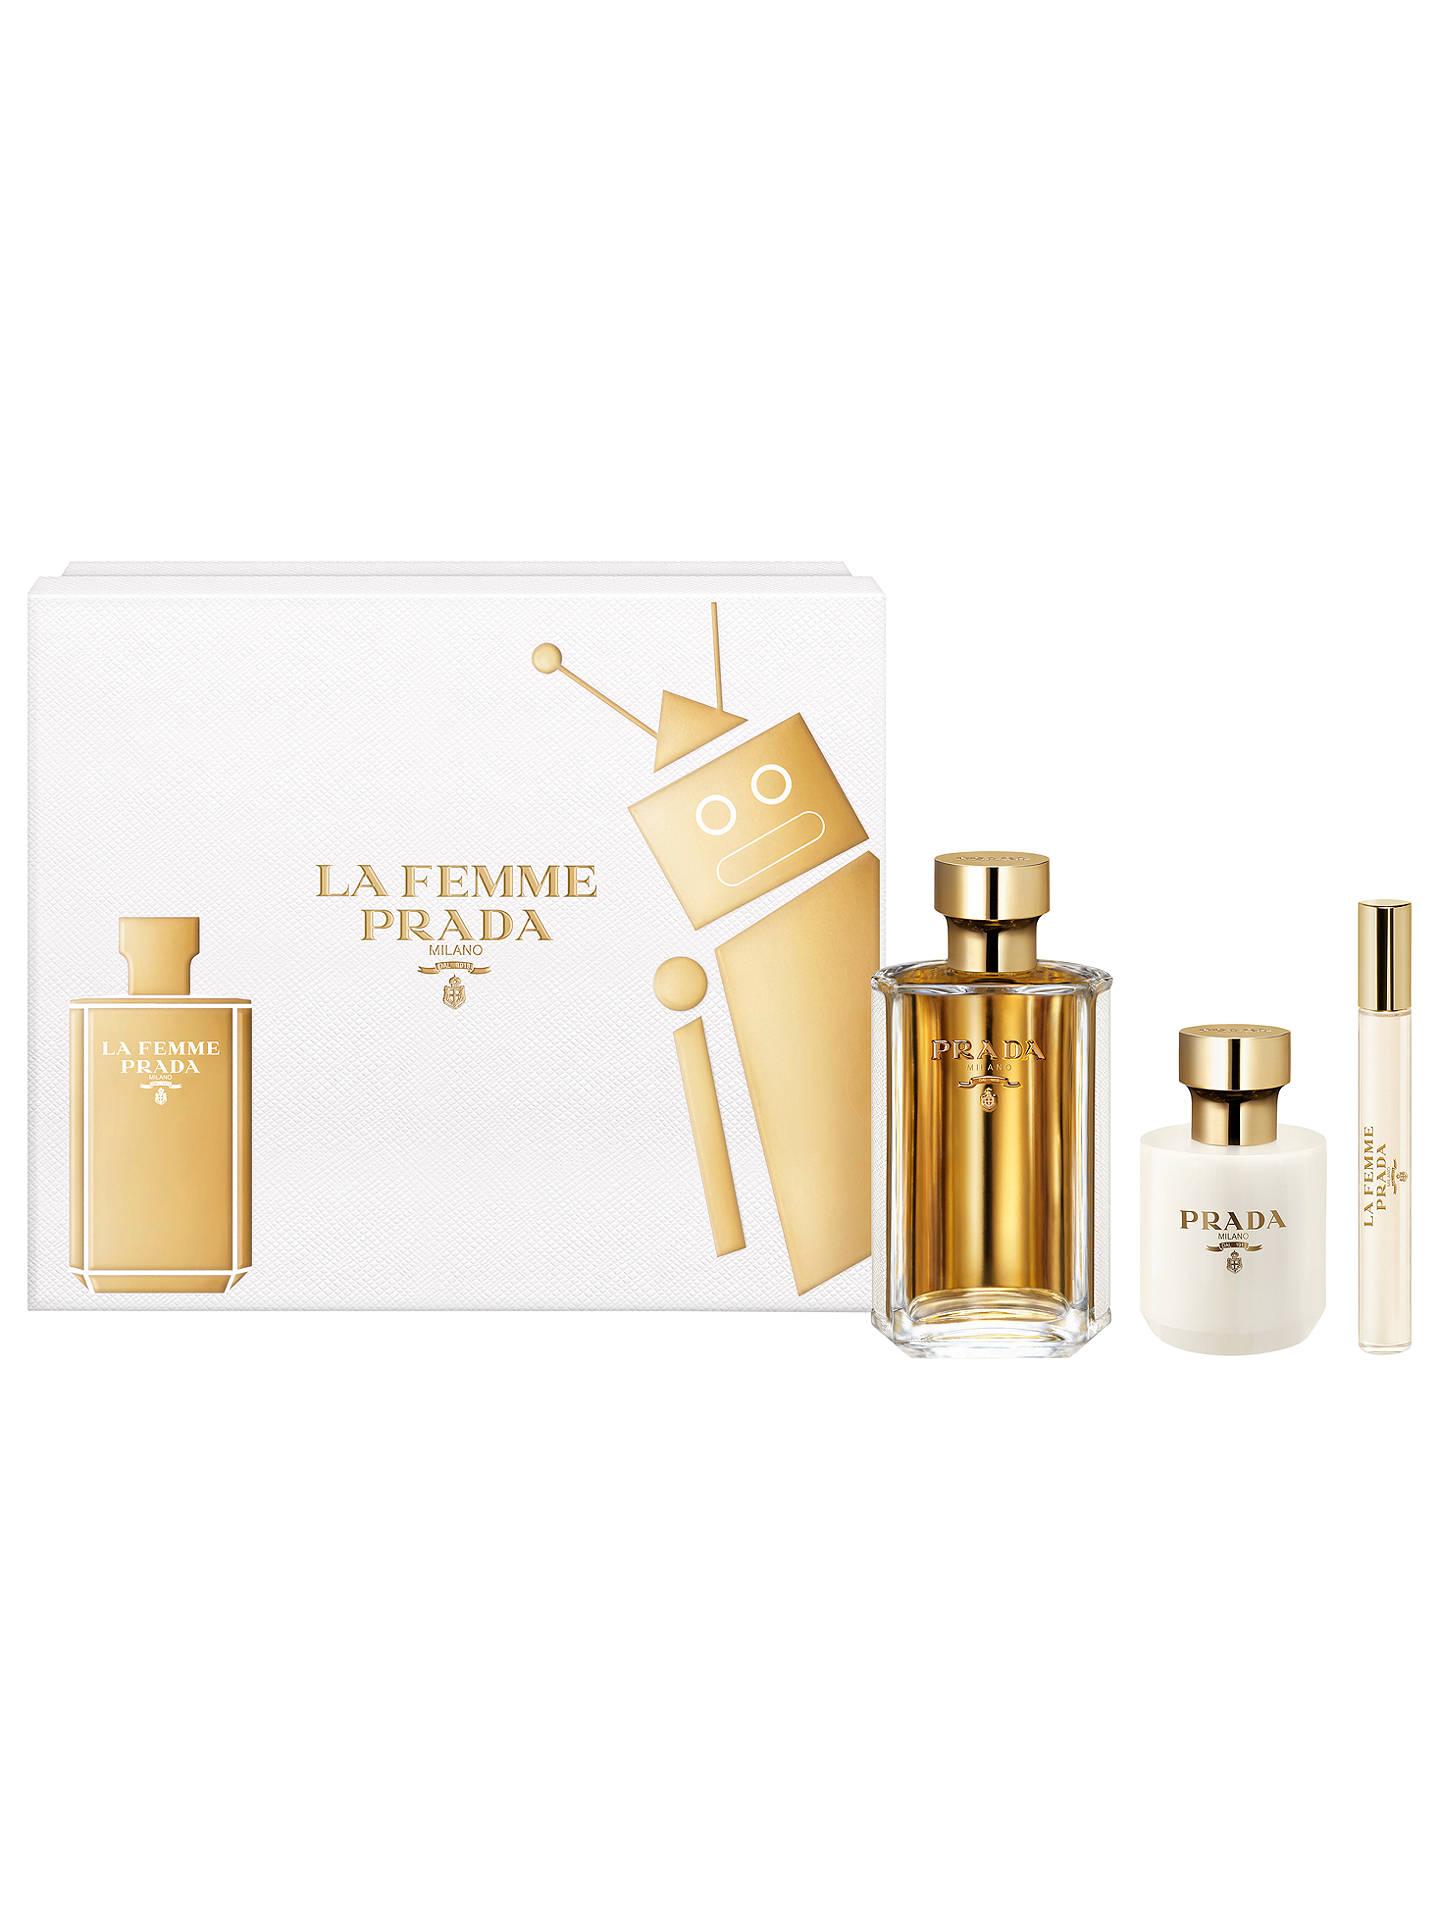 e35cfb6939dca Buy Prada La Femme 100ml Eau de Parfum Fragrance Gift Set Online at  johnlewis.com